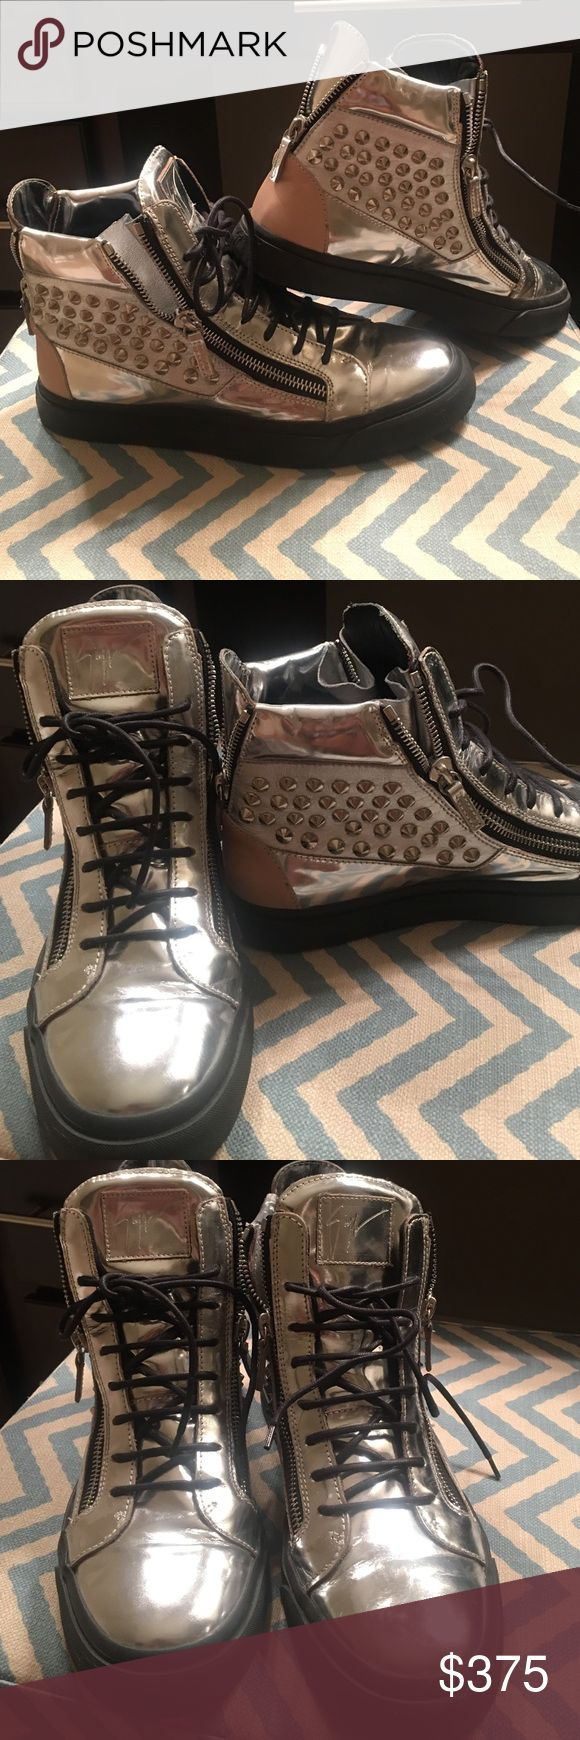 Men's Giuseppe Zanotti Sneakers Super dope pair of men's Giuseppe sneakers. Worn 1-2x and in excellent condition. No missing studs. Great addition to your wardrobe! Giuseppe Zanotti Shoes Sneakers